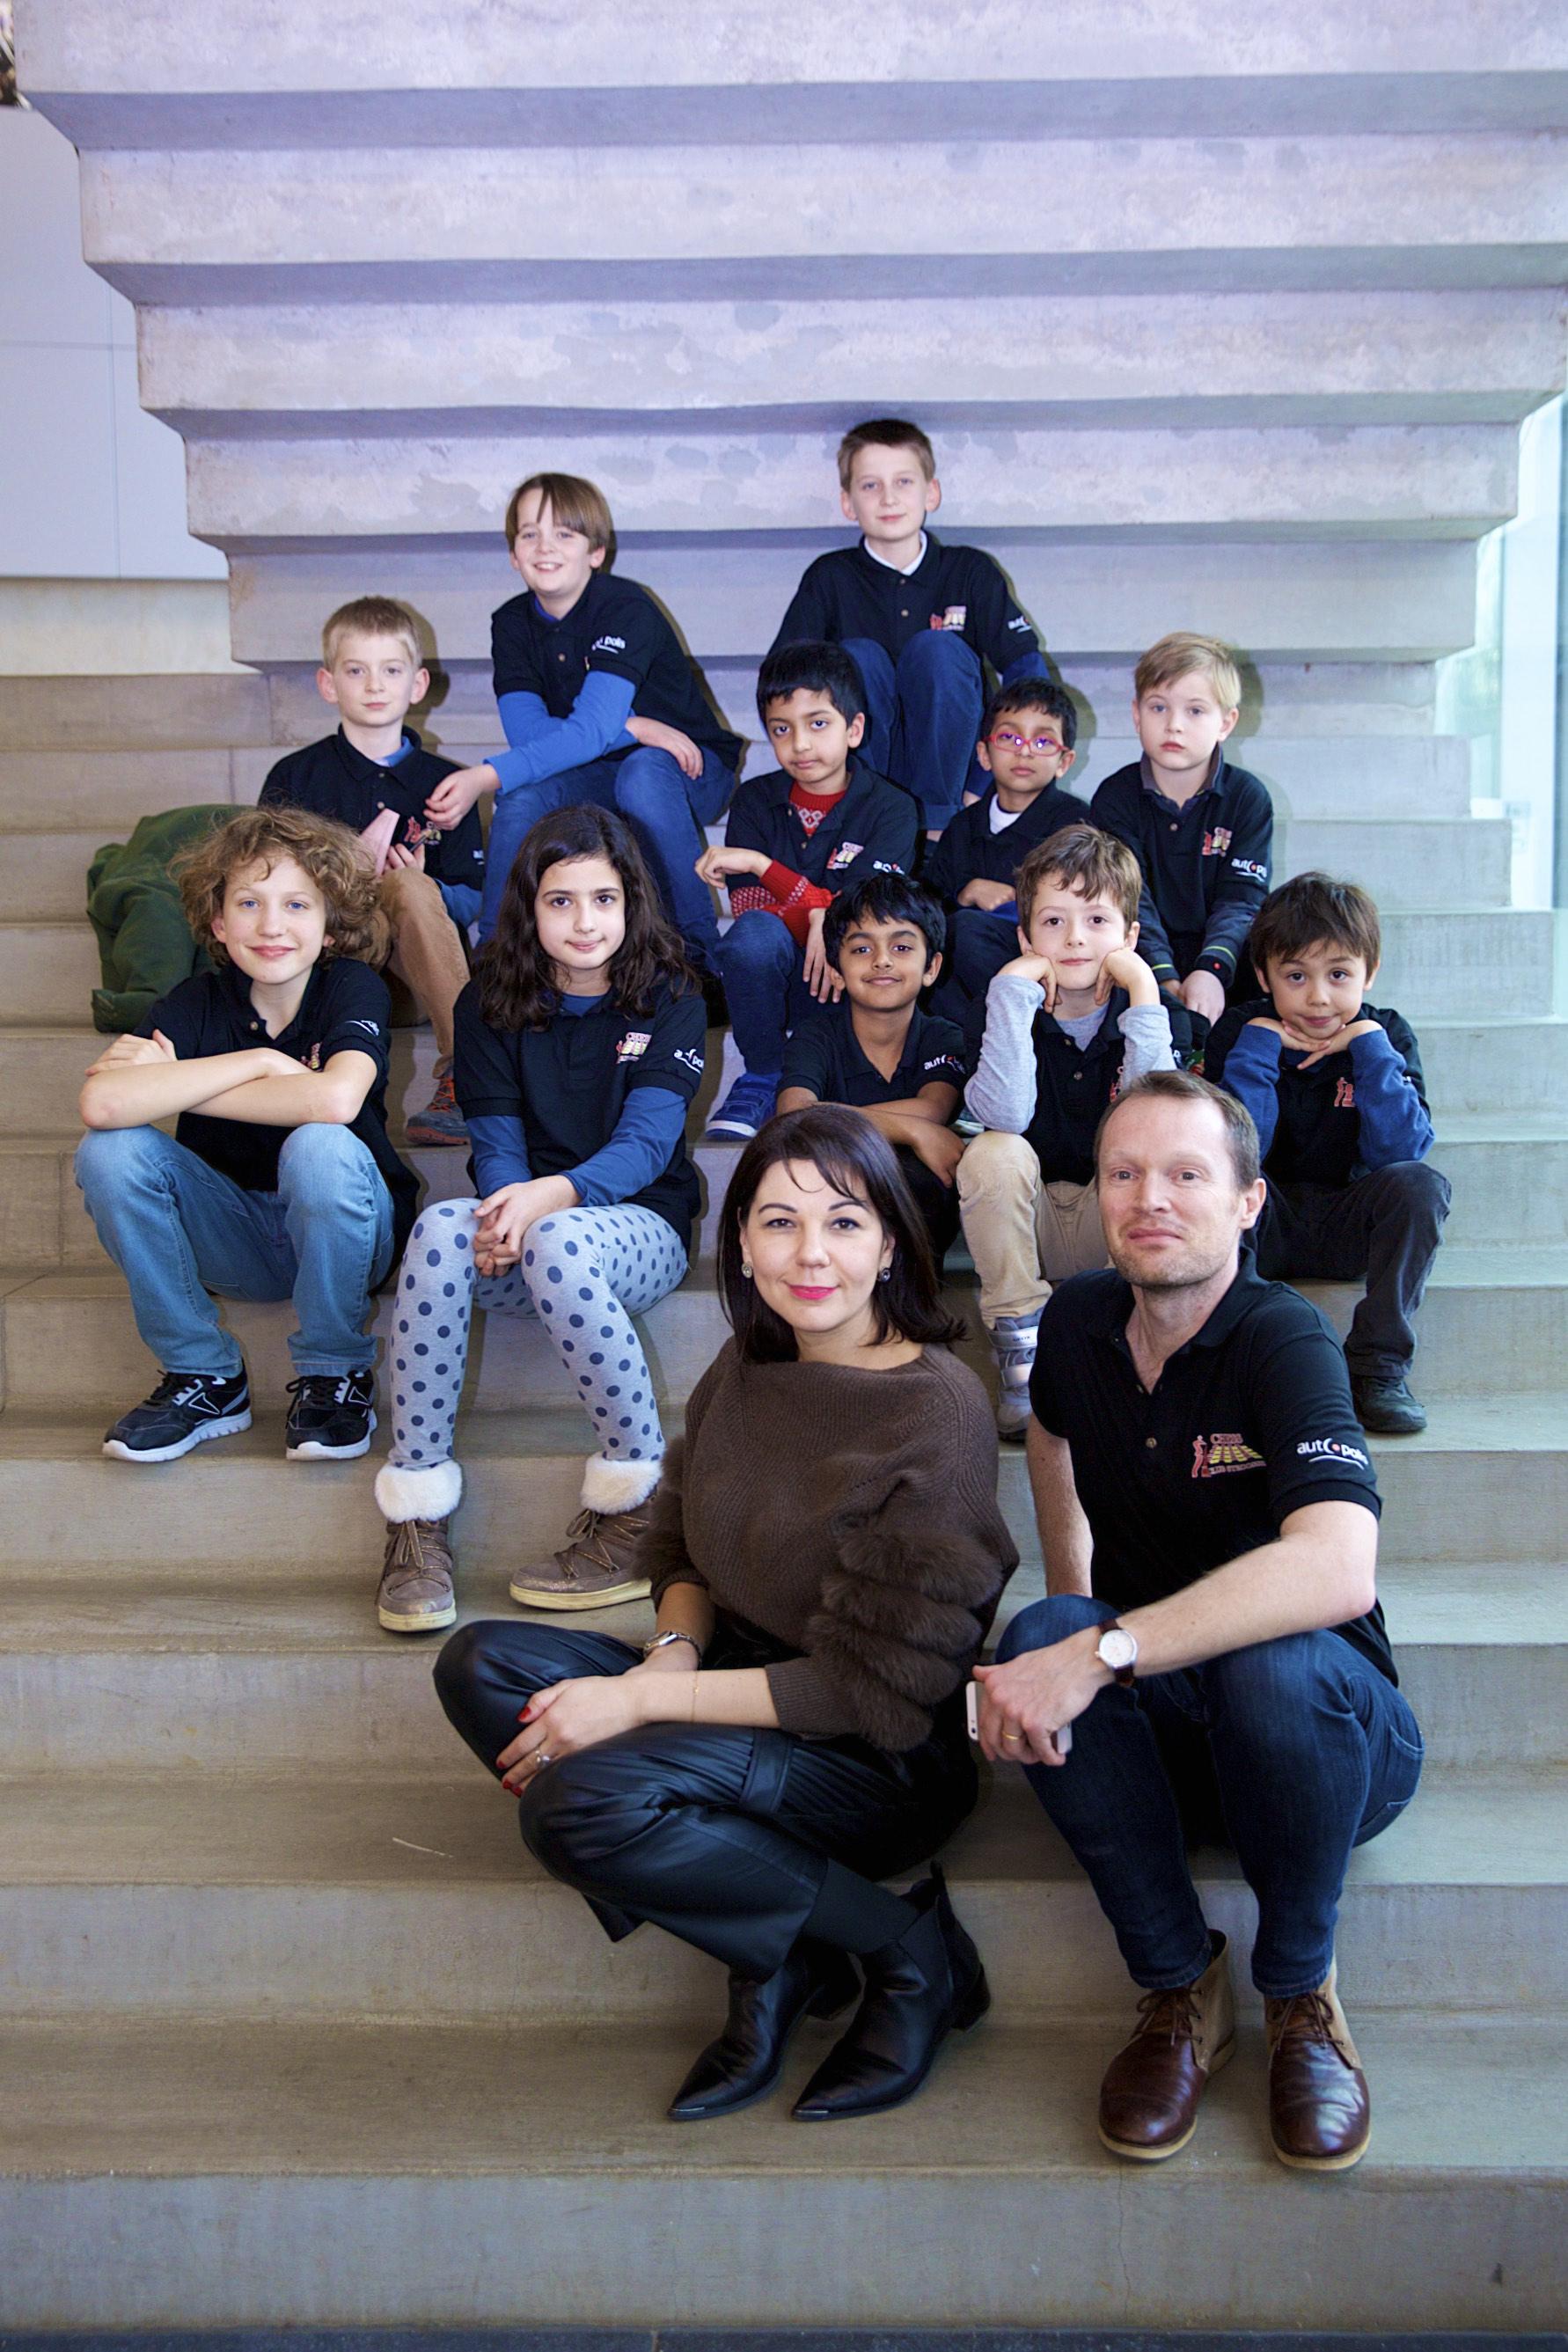 Chess results - Championnat Individuel Jeunes - Differdange - 18-19-25-26 Janvier